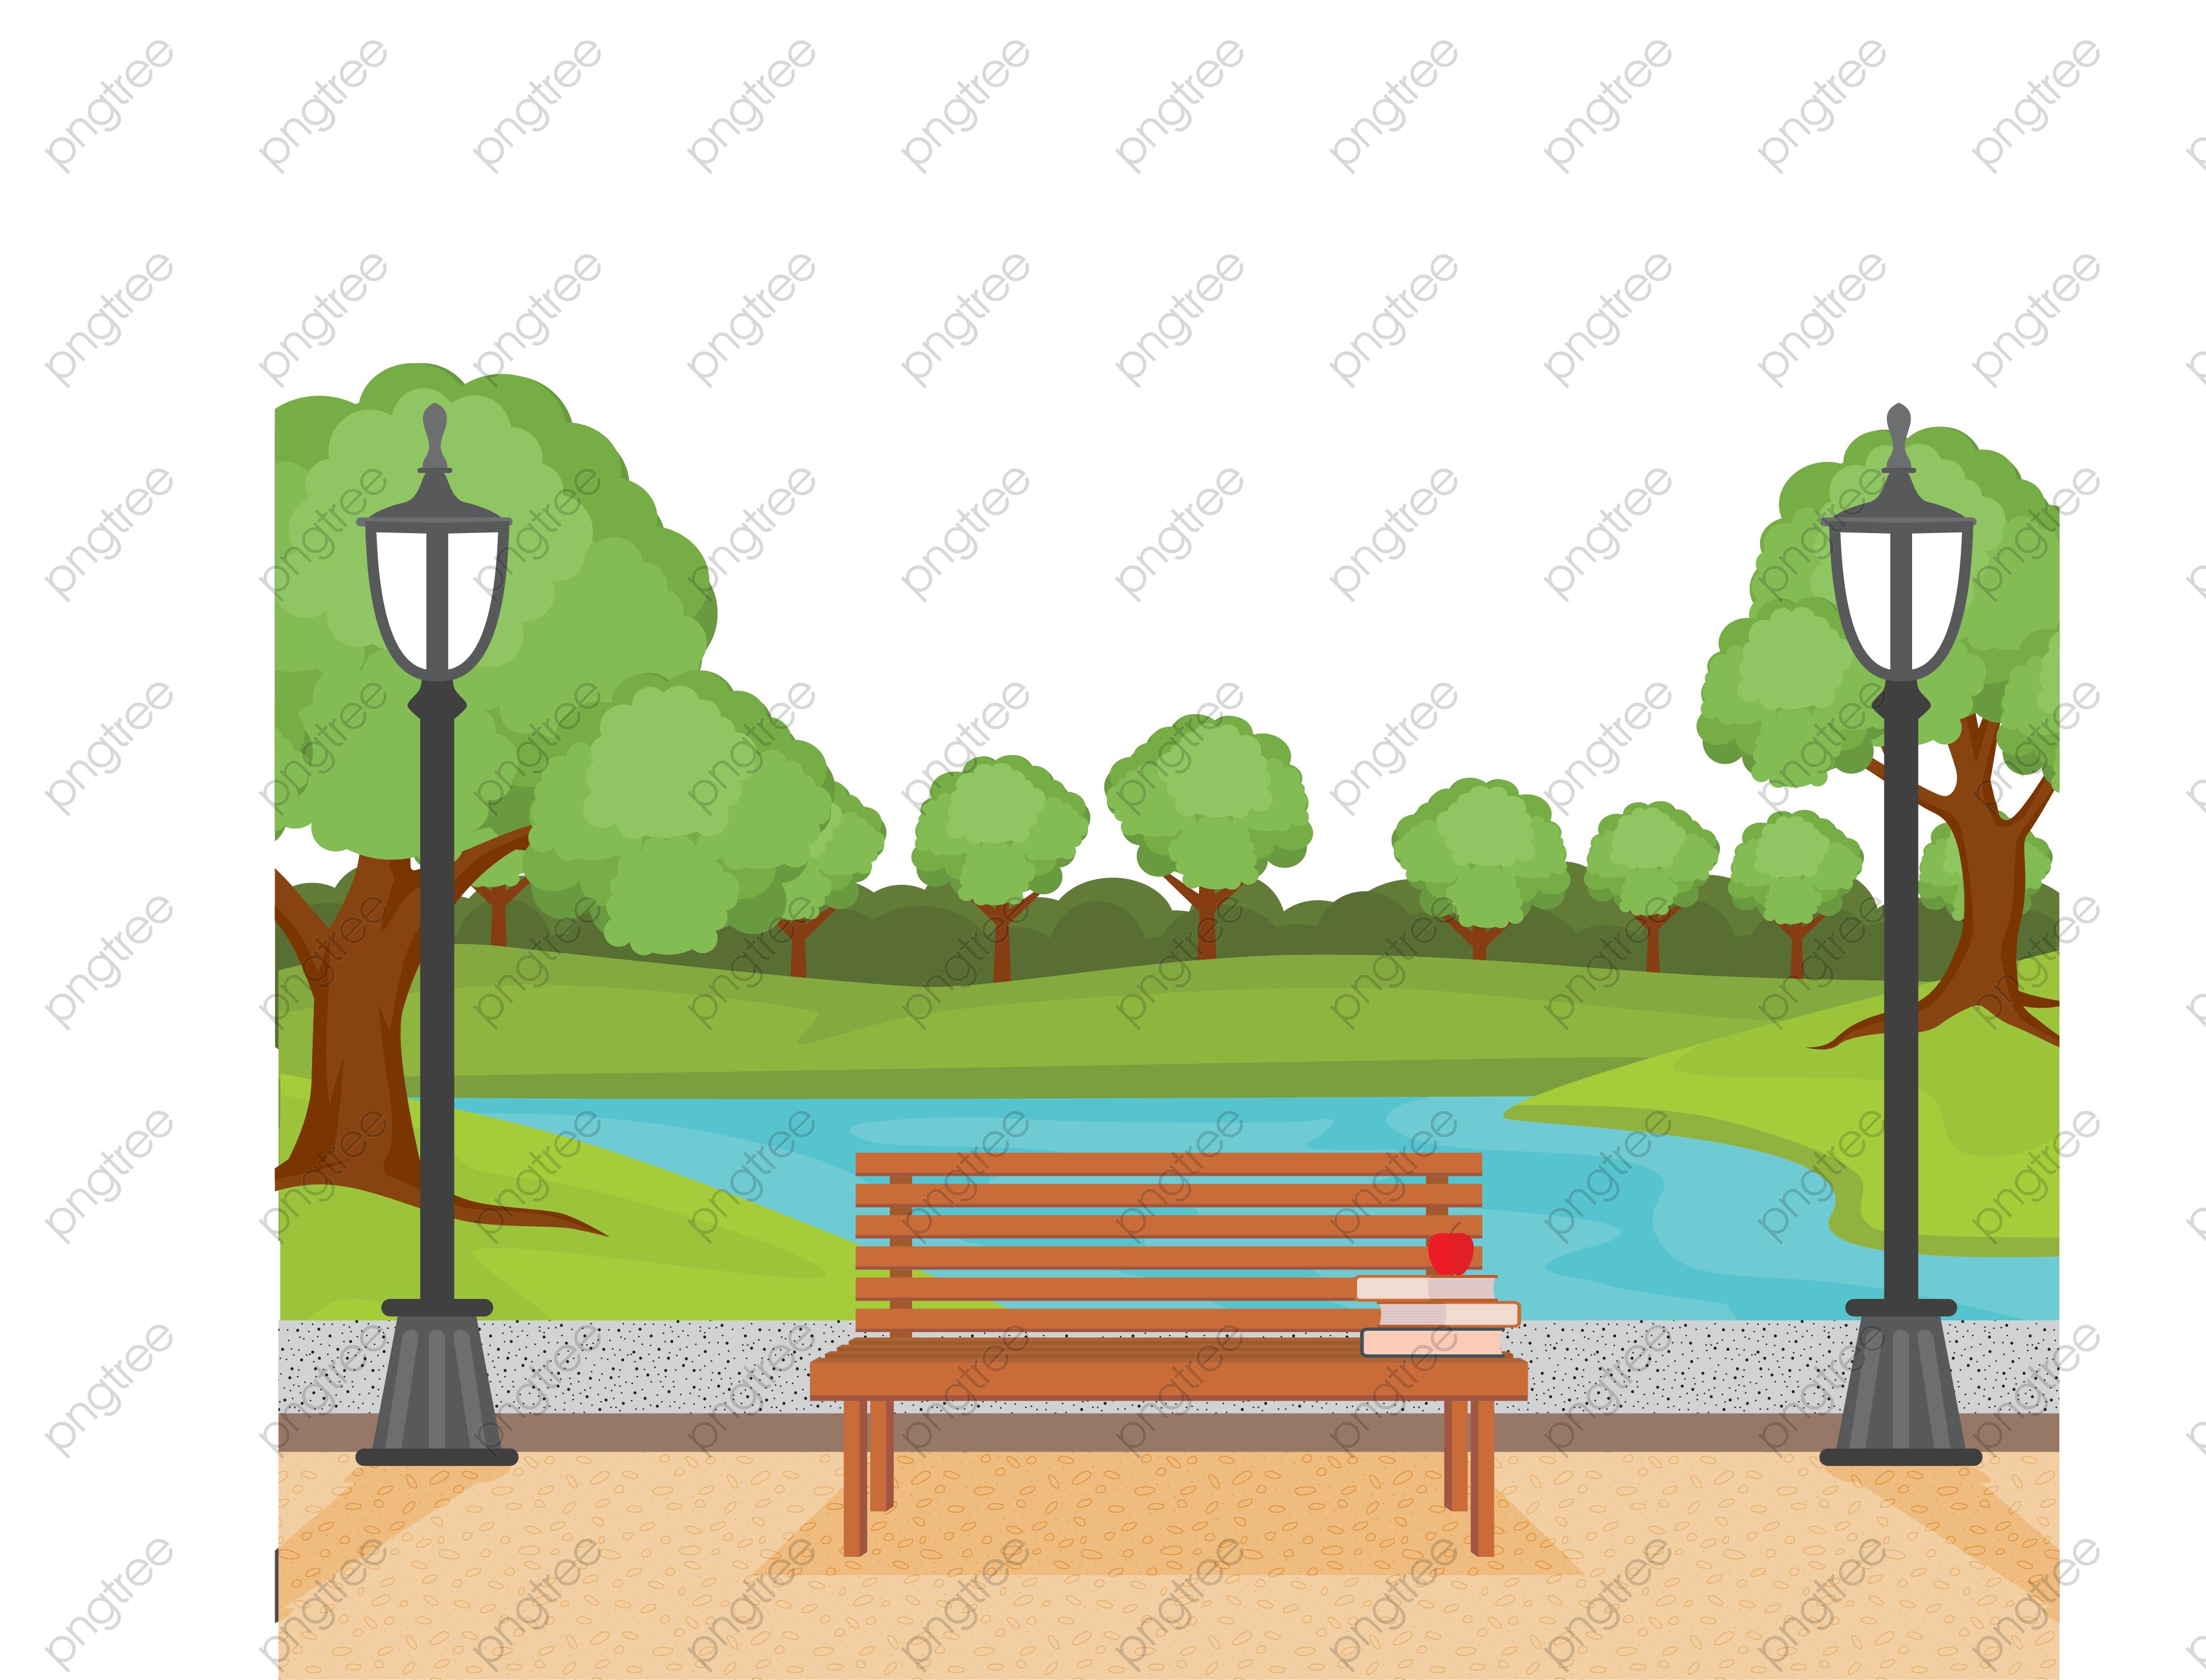 City Park Bench Png & Free City Park Bench.png Transparent Images.